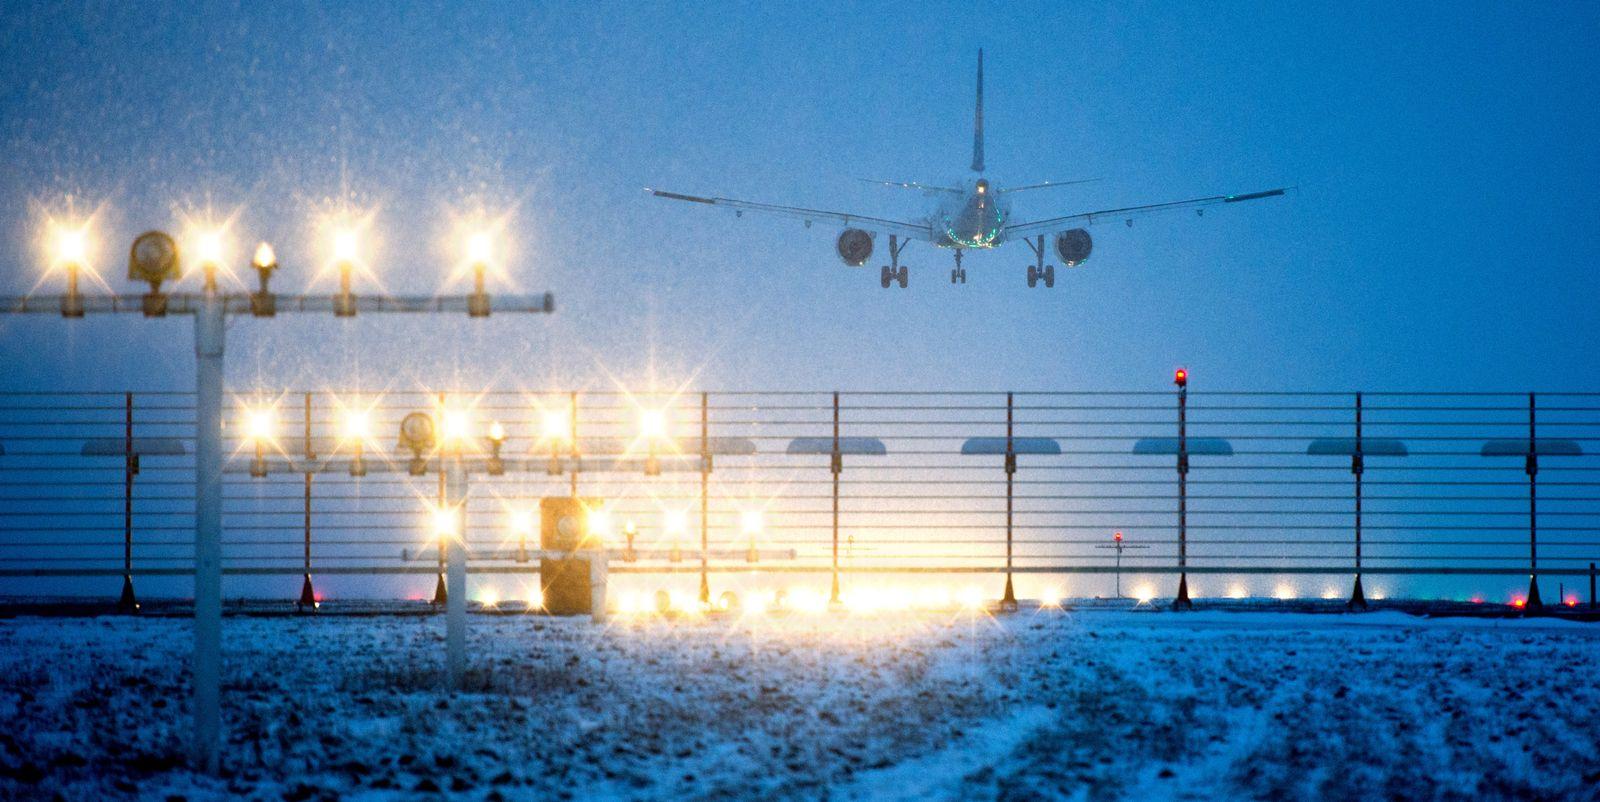 Winter / Flughafen Hannover